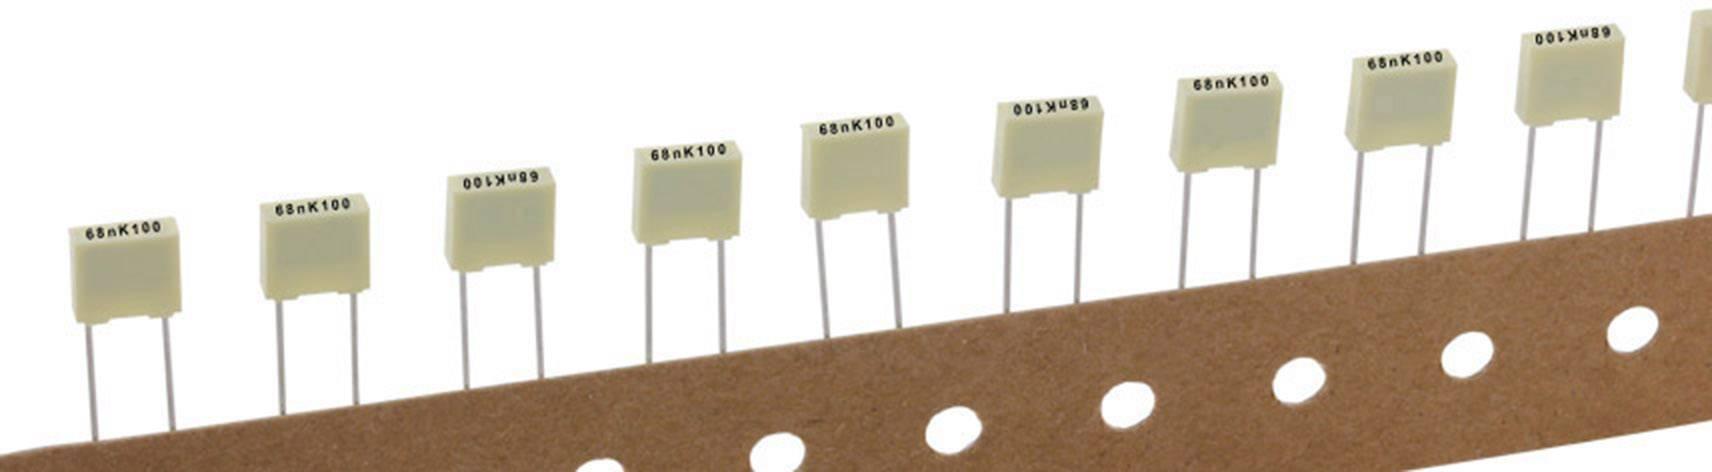 Polyesterový kondenzátor Kemet R82EC1100DQ50K+ radiálne vývody, 1 nF, 100 V,10 %, 5 mm, (d x š x v) 7.2 x 2.5 mm x 6.5 mm, 1 ks